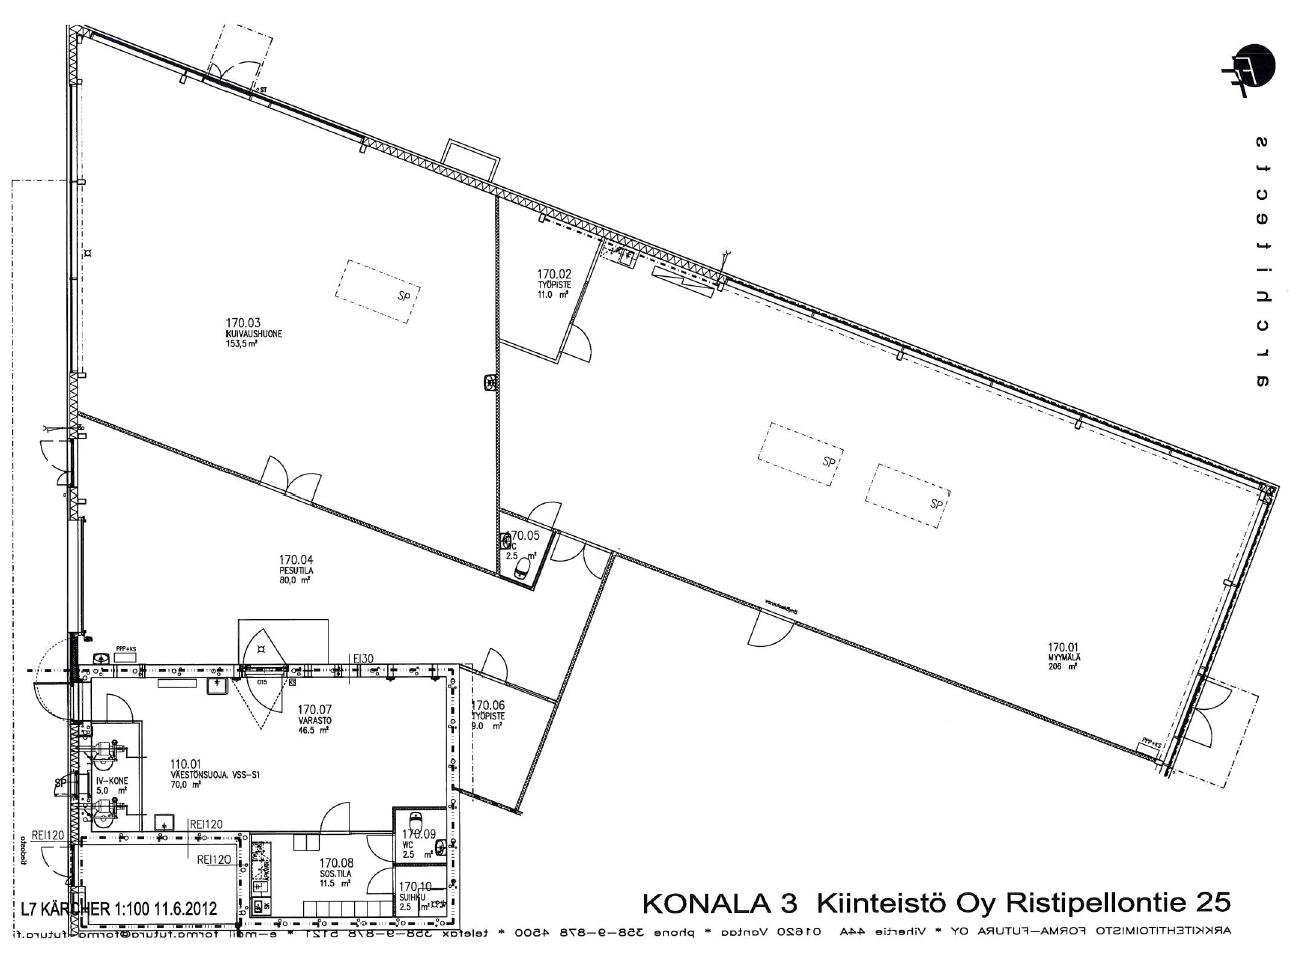 Planlösning Ristipellontie 25 Konala